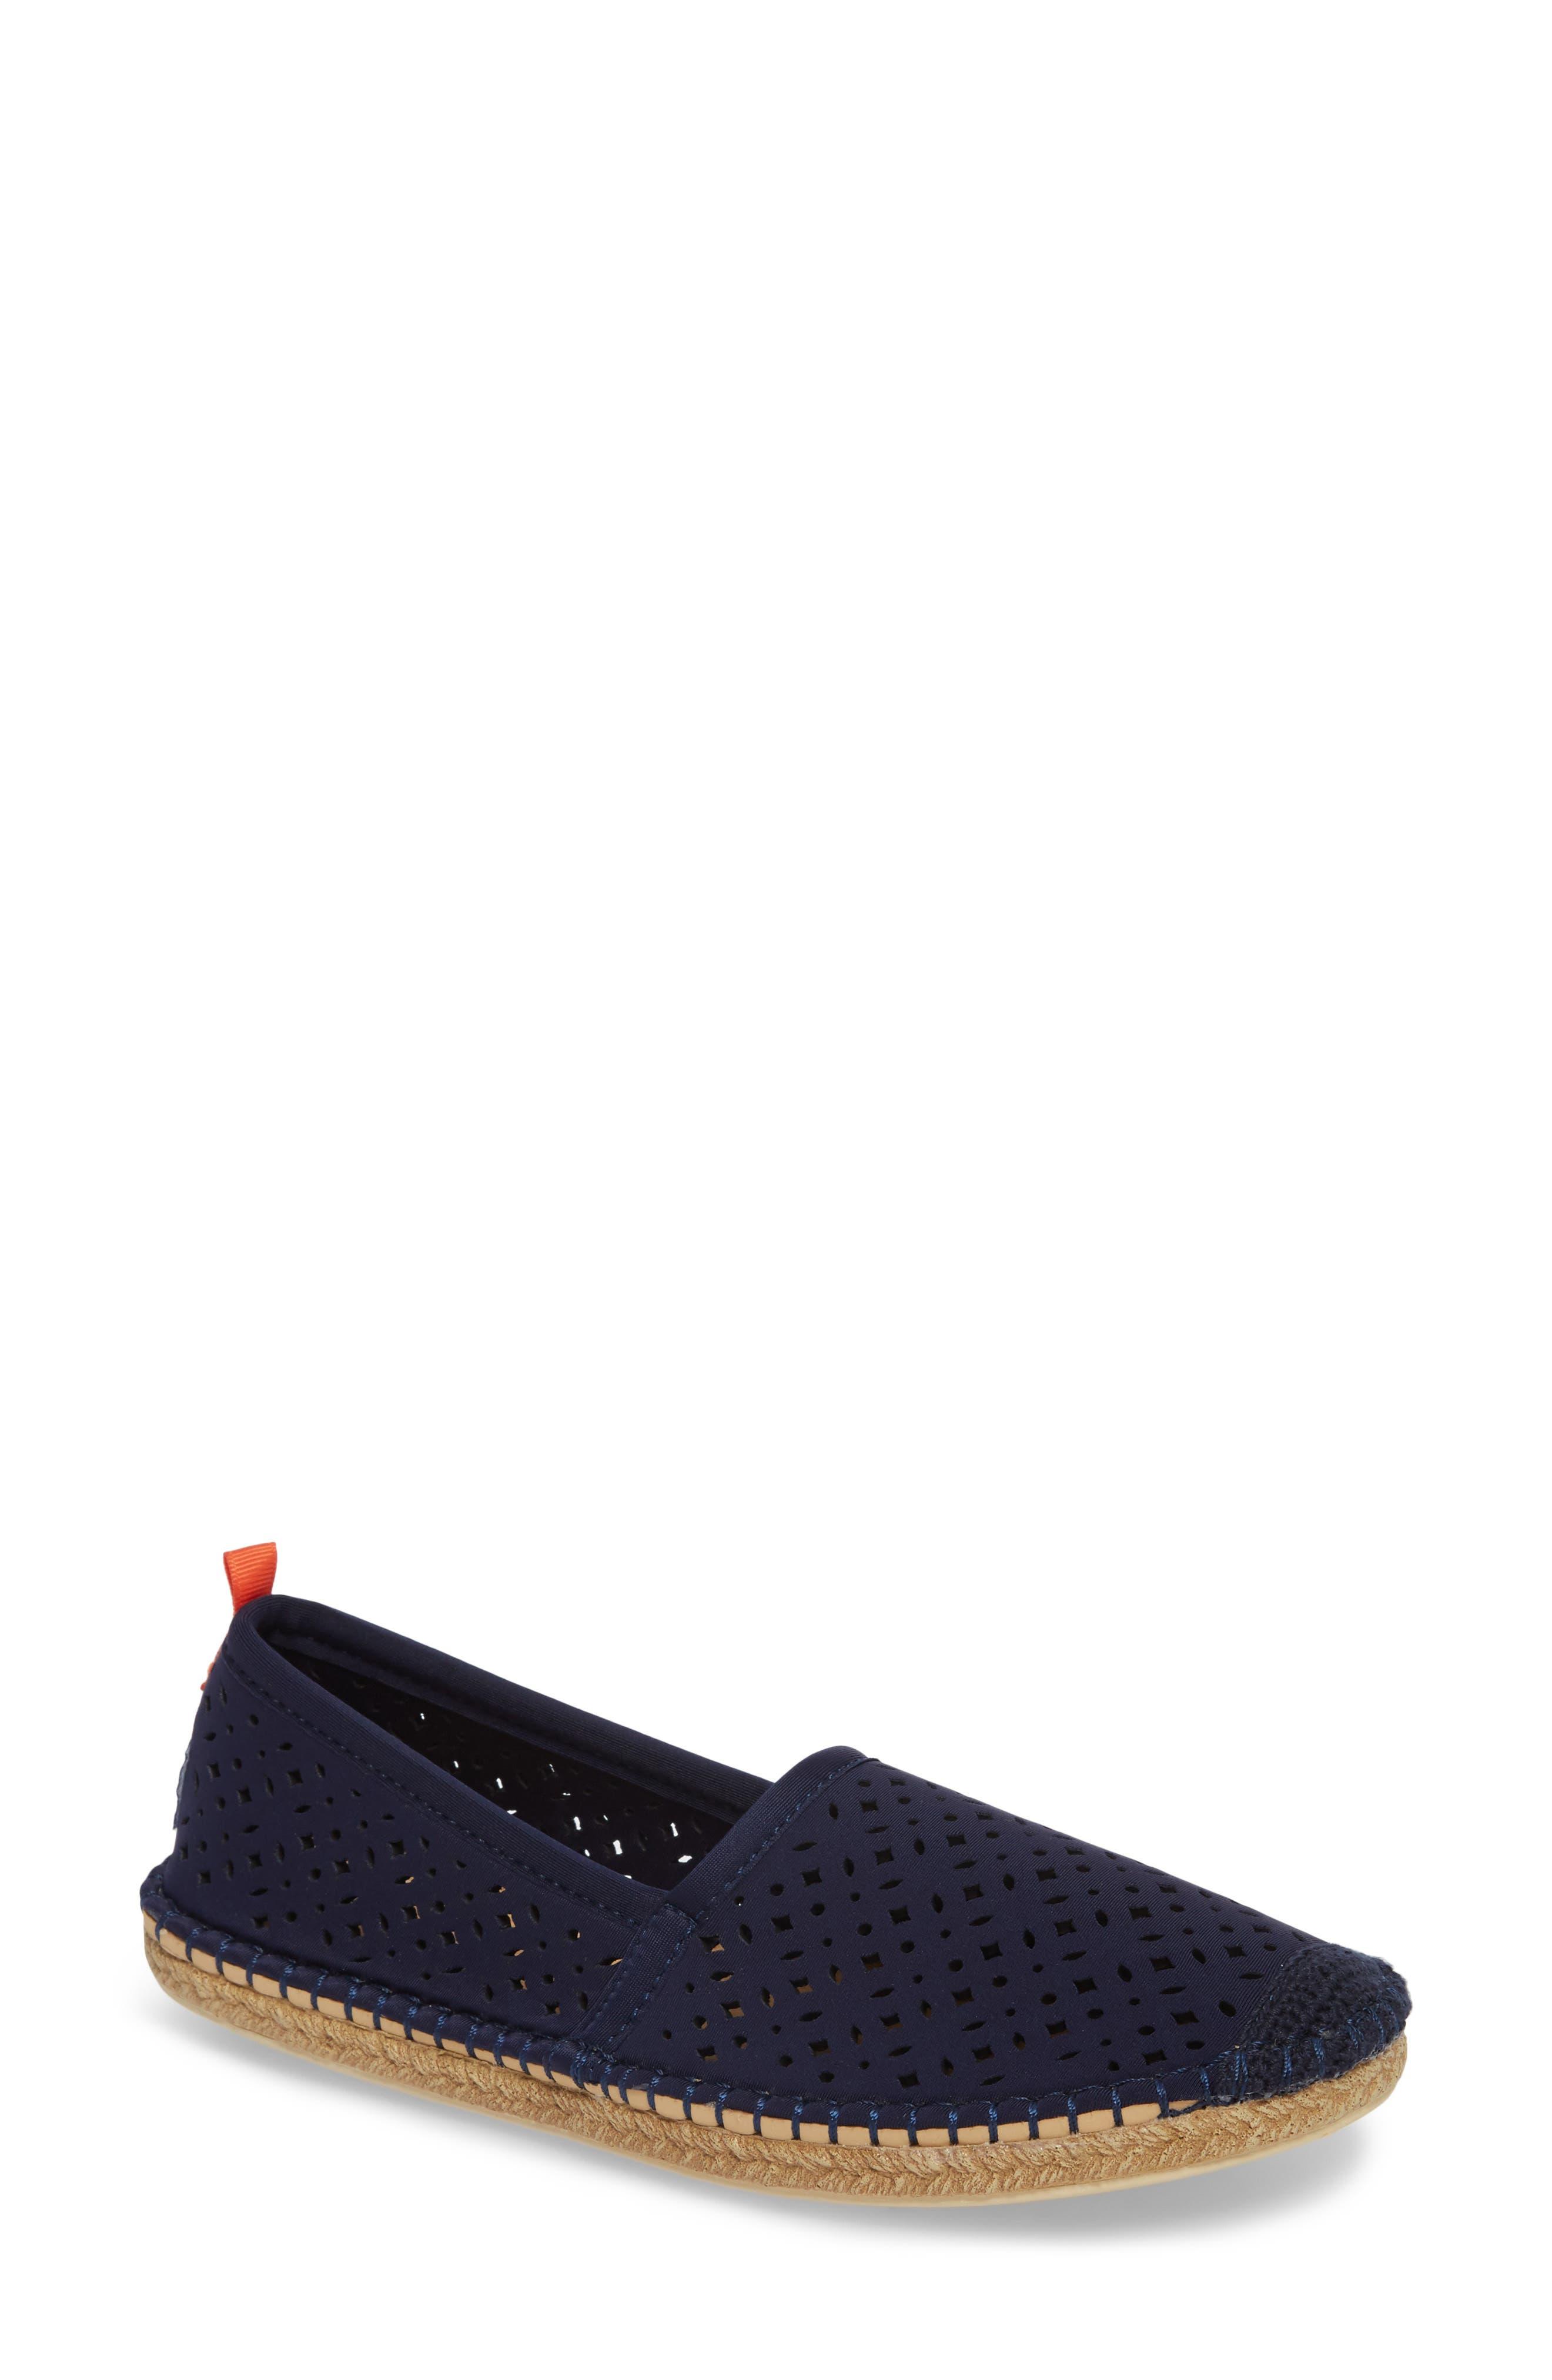 Sea Star Beachcomber Espadrille Sandal,                         Main,                         color, Dark Navy Eyelet